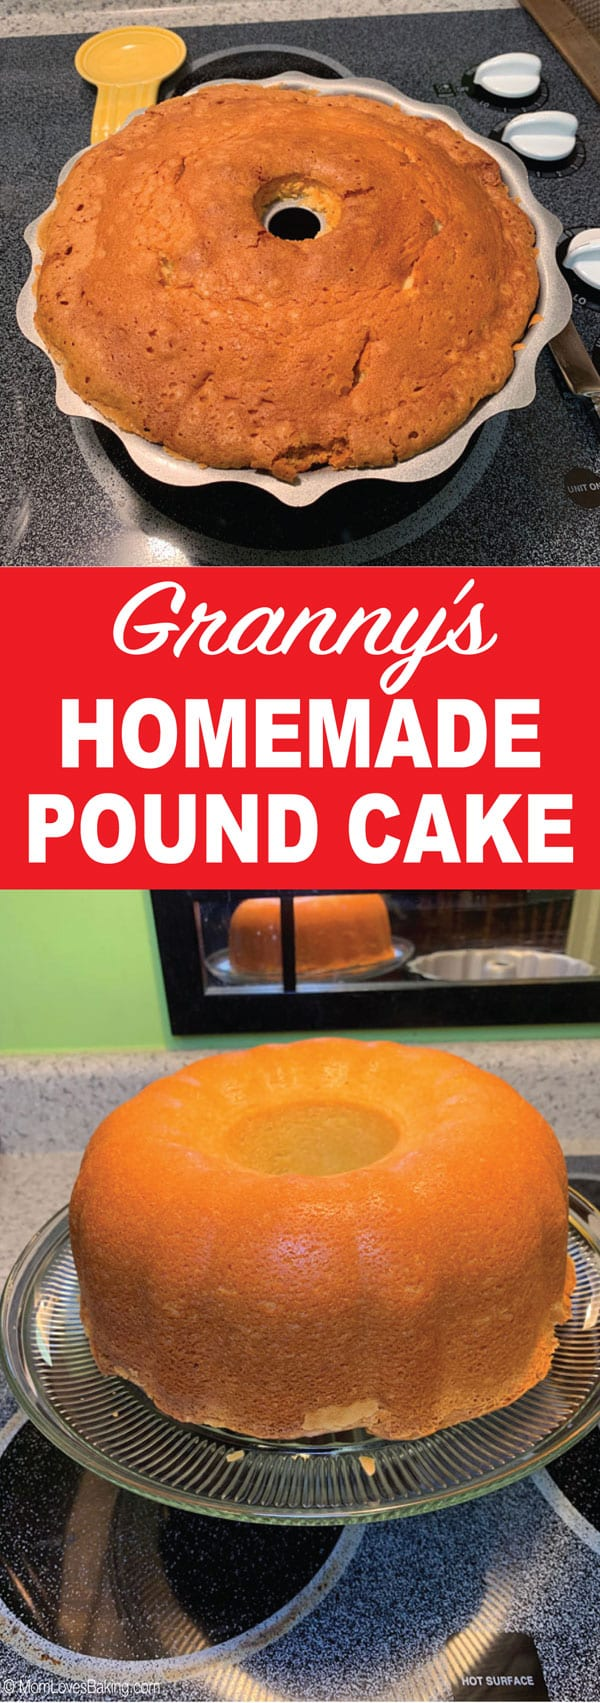 Granny's famous pound cake recipe